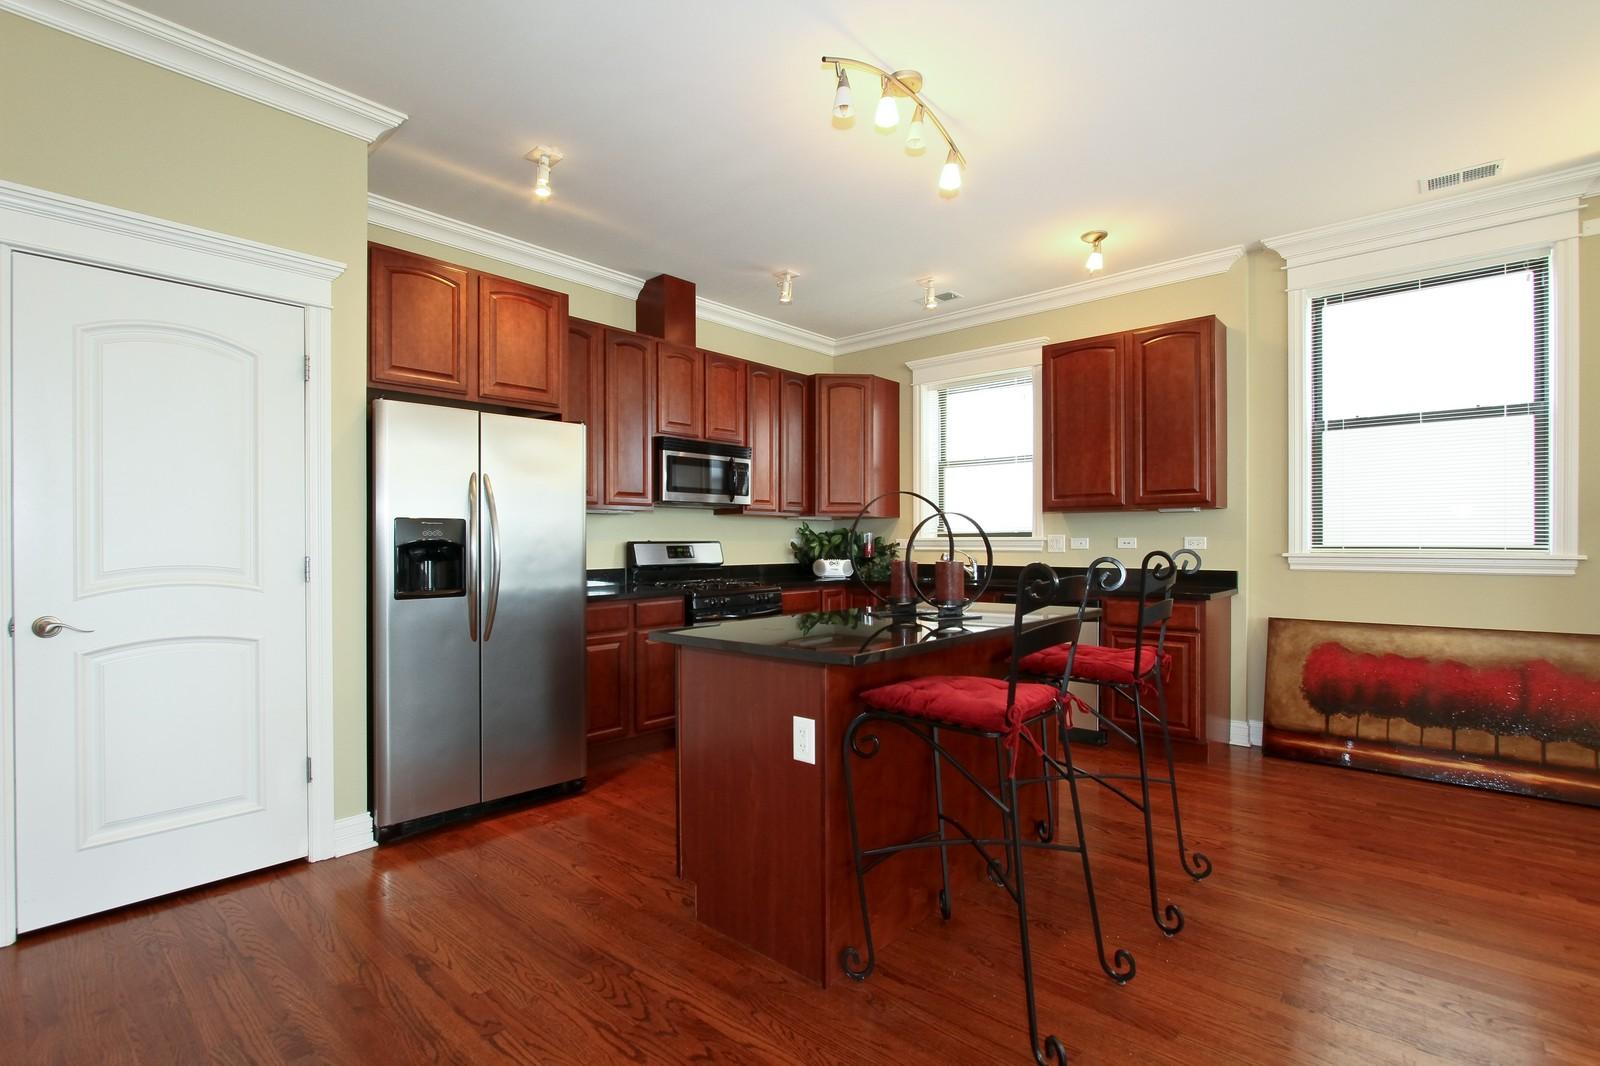 Real Estate Photography - 4815 S Drexel, Unit 3SW, Chicago, IL, 60615 - Kitchen